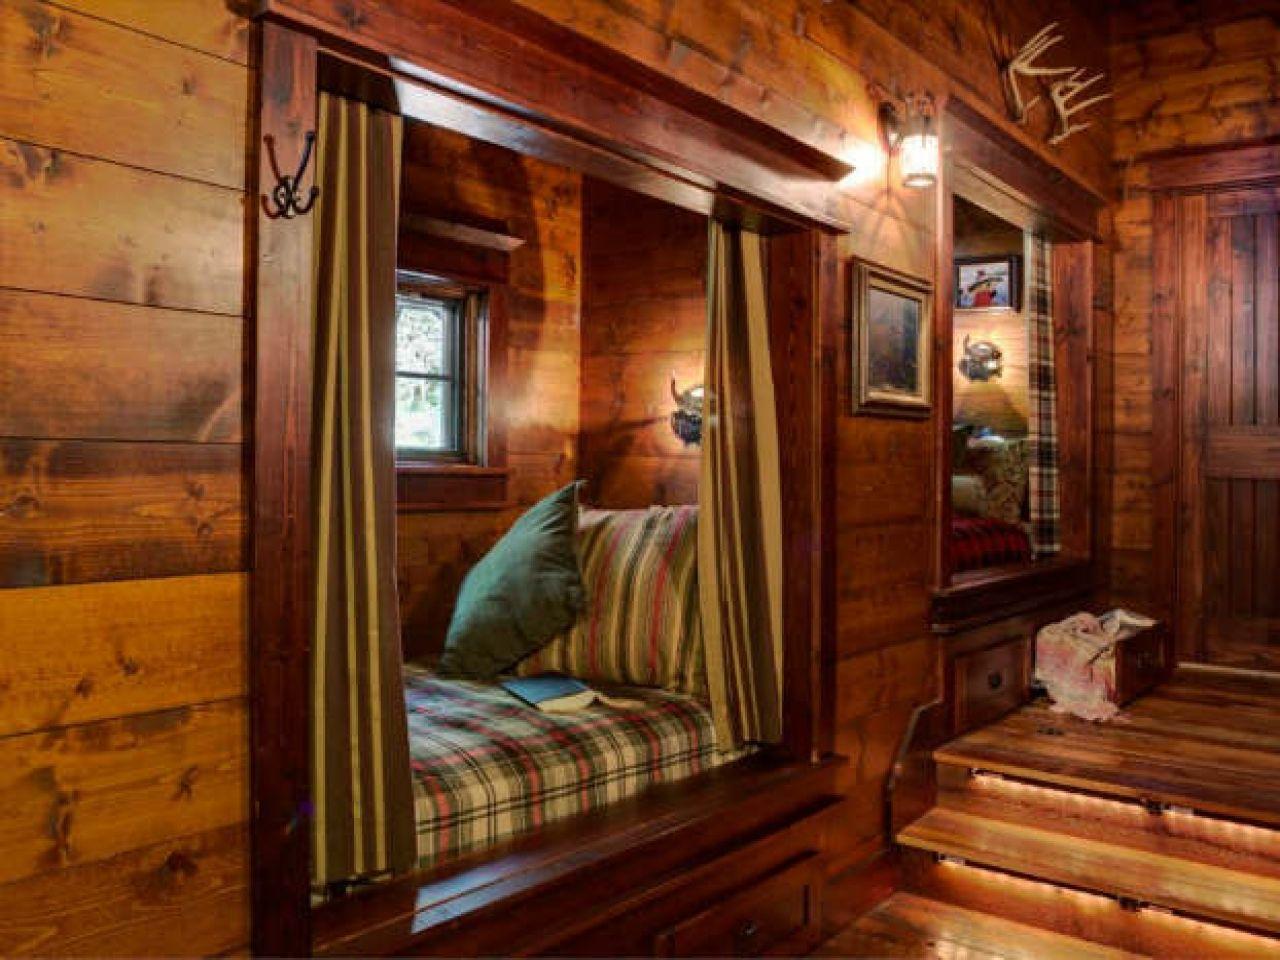 Modern cabin interior - Image Result For Modern Cabin Interior Design